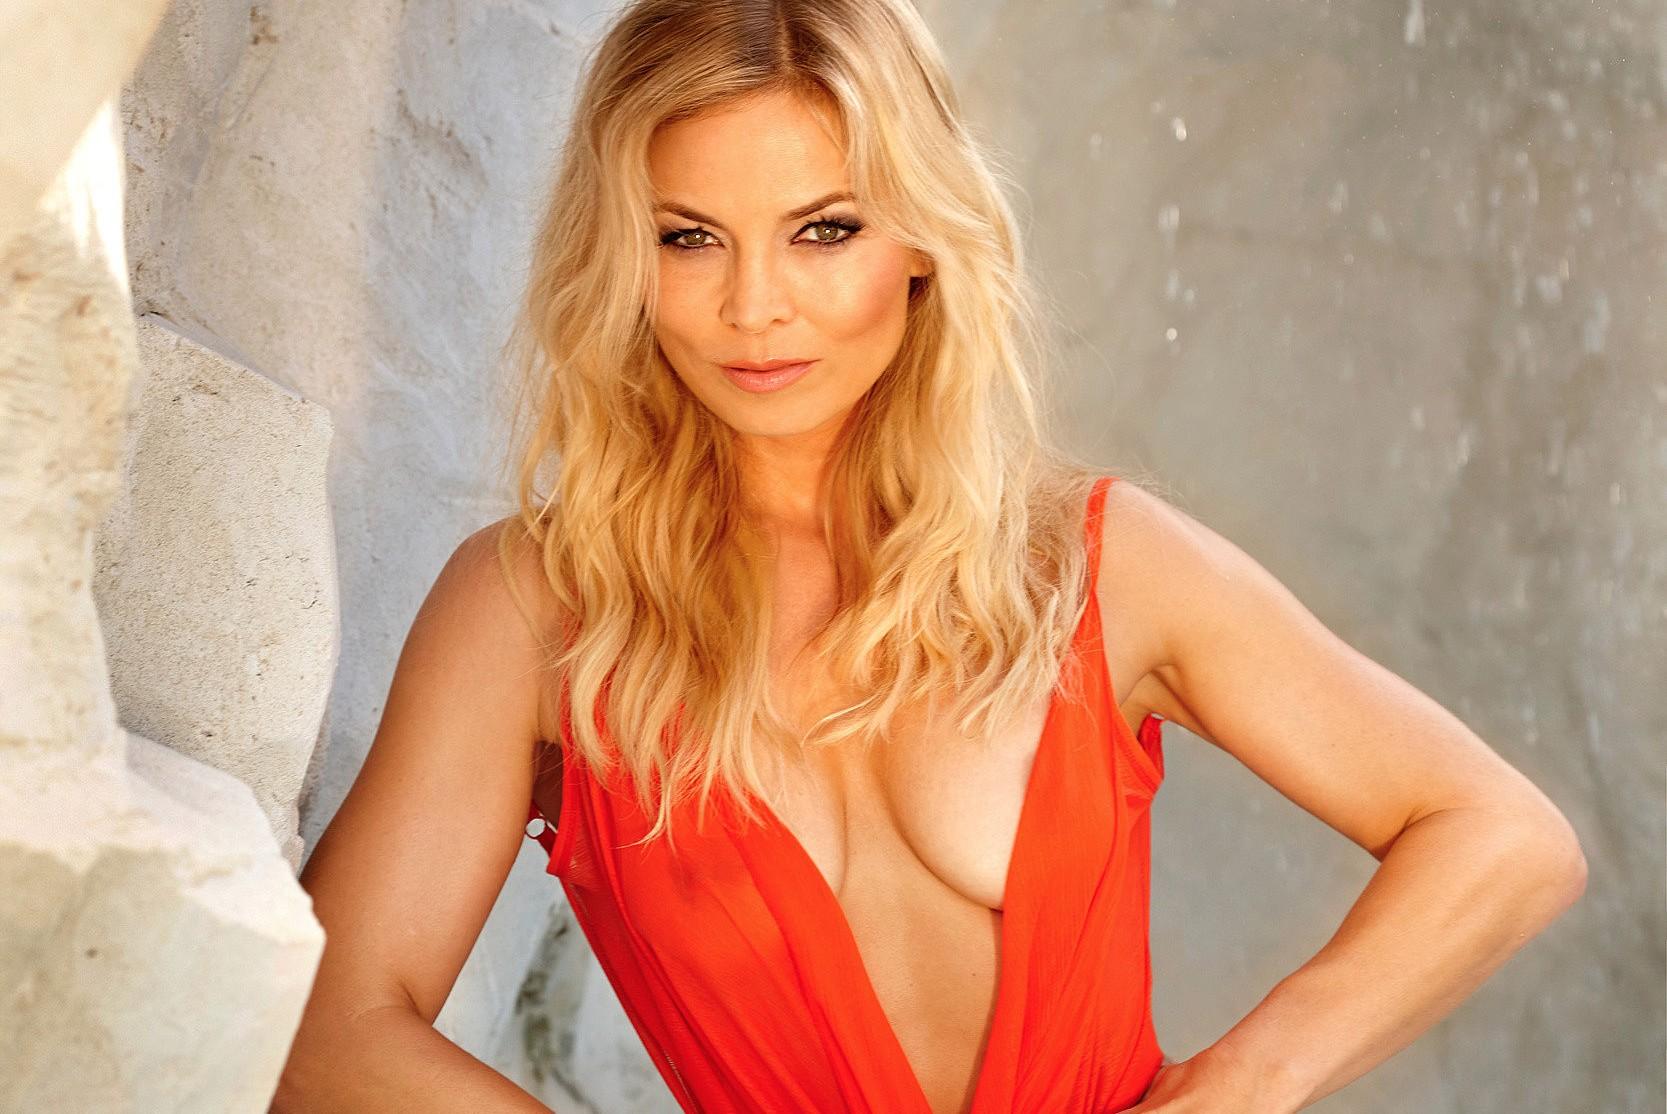 Regina Halmich - Playboy Germany March 2015 Coverstar